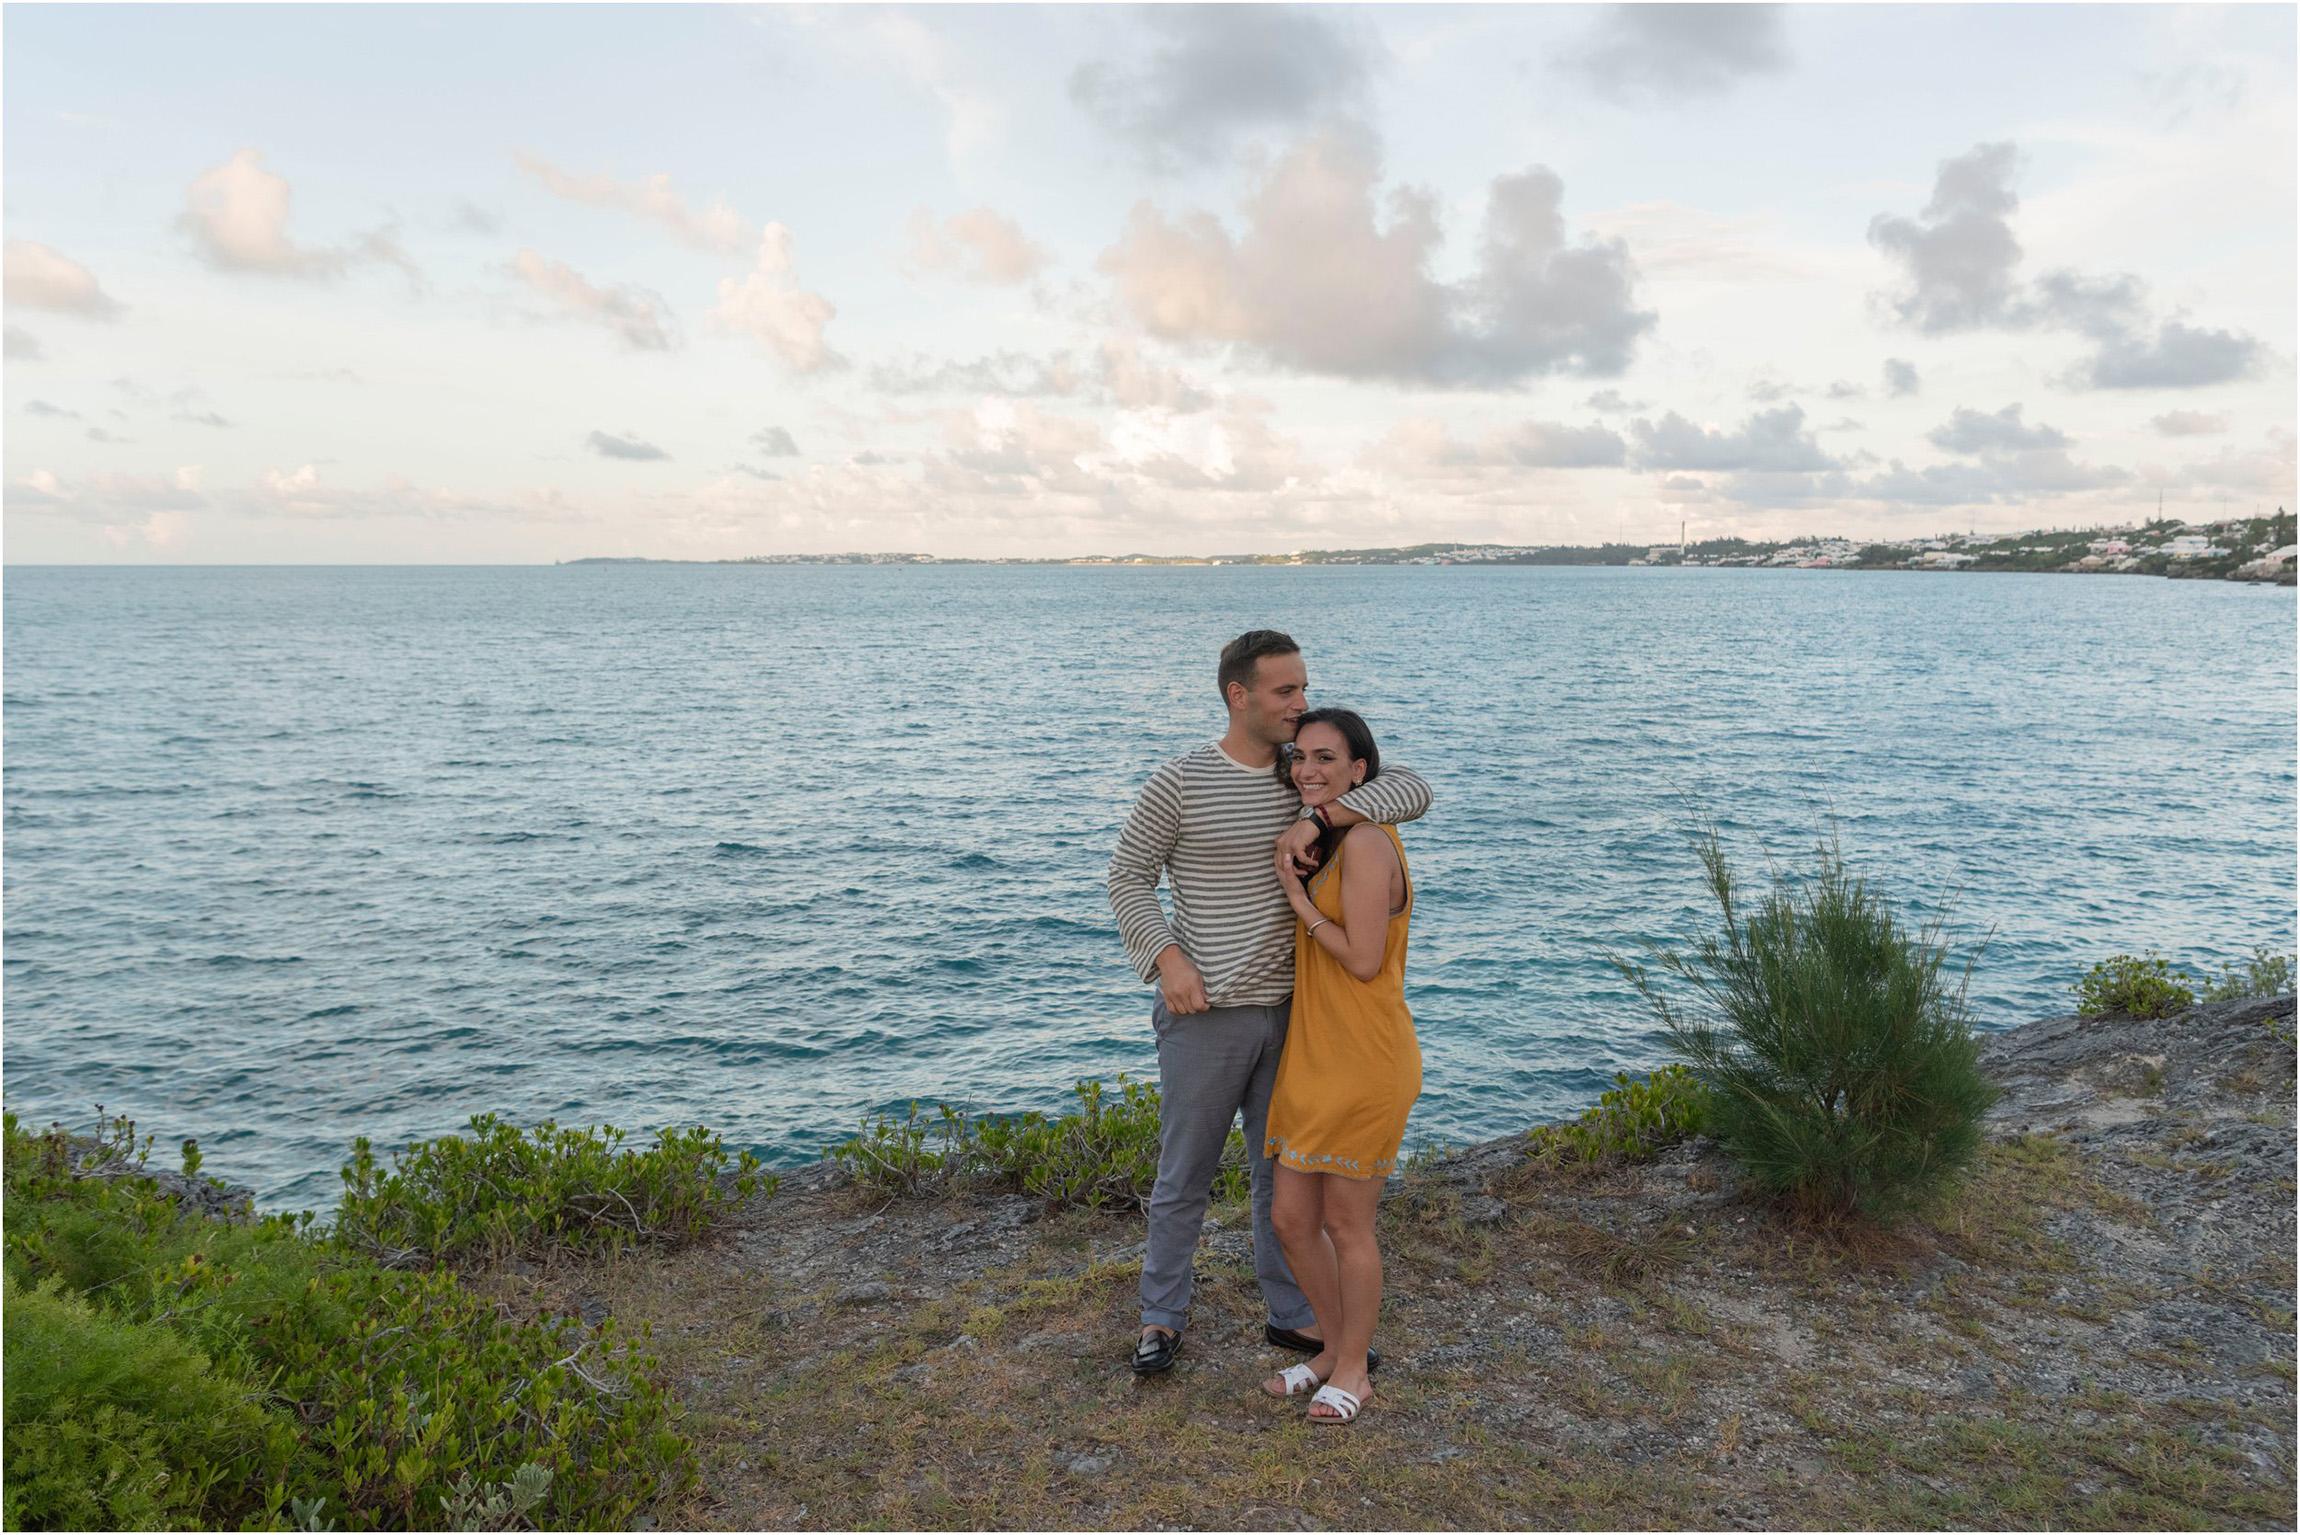 ©FianderFoto_Proposal Photographer_Bermuda_Admiralty House_Kresnick_Rina_006.jpg